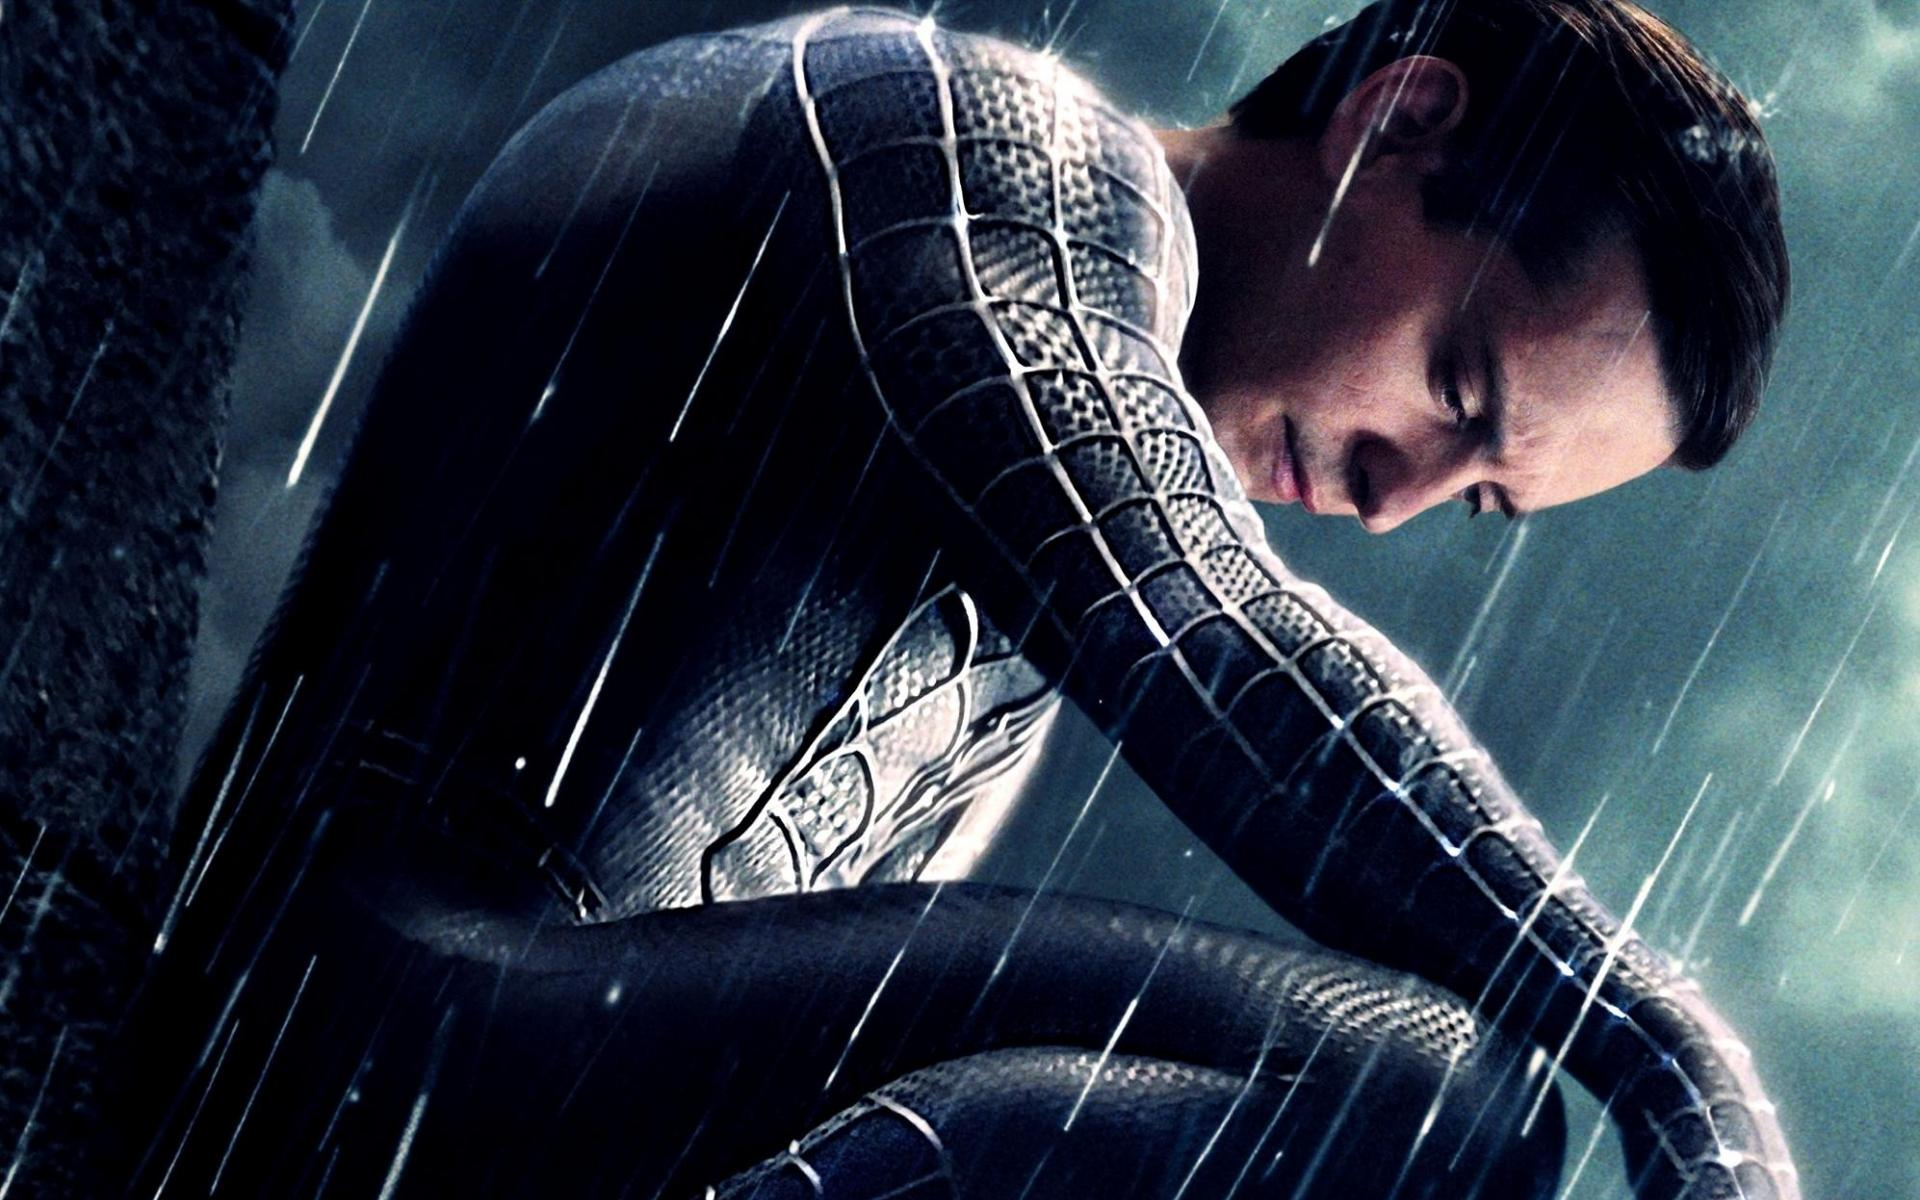 Spider Man 3 Fondo De Pantalla Hd Fondo De Escritorio